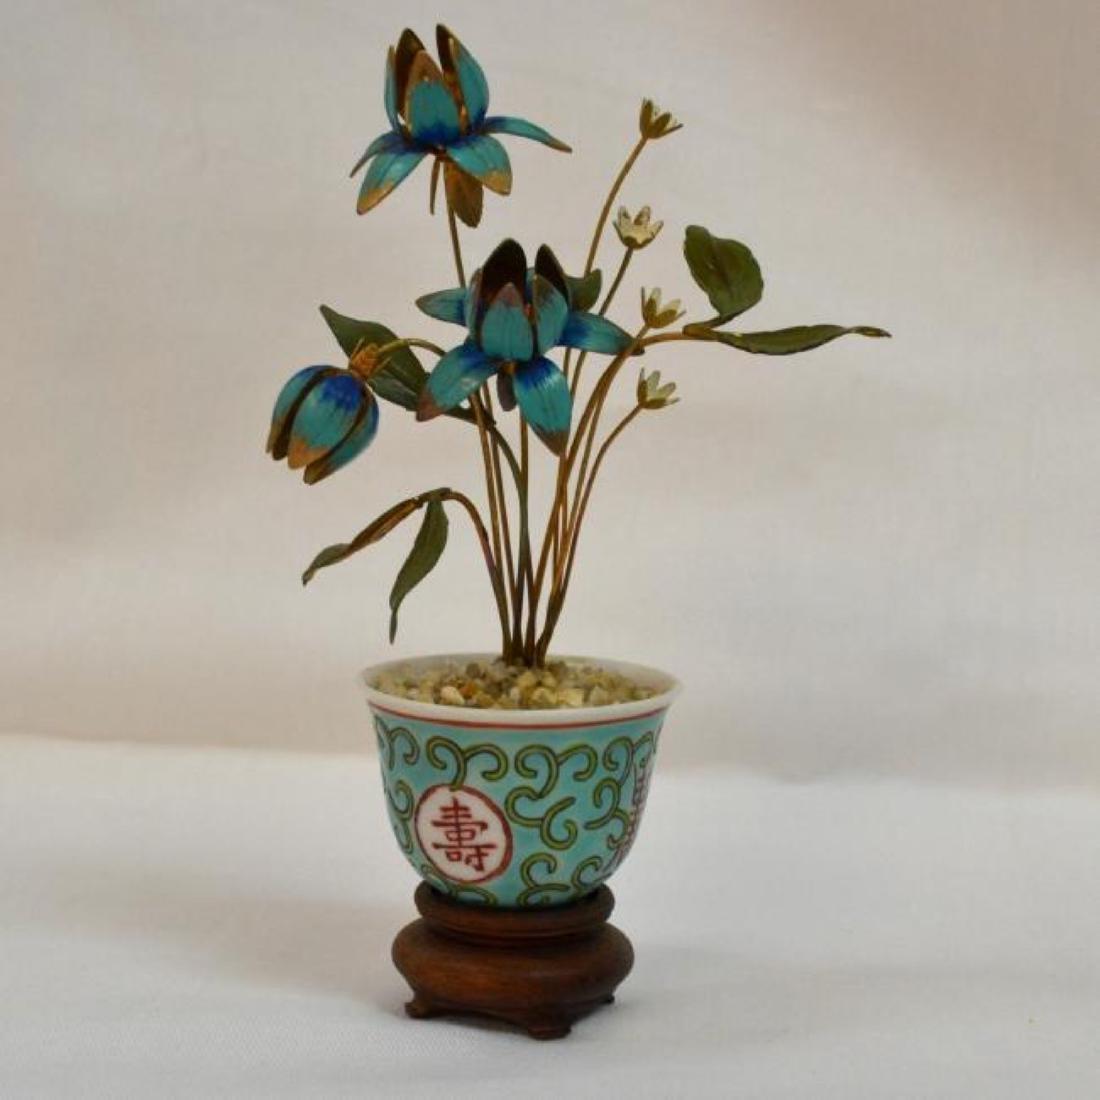 Antique chinese porcelain, enamel and bronze planter